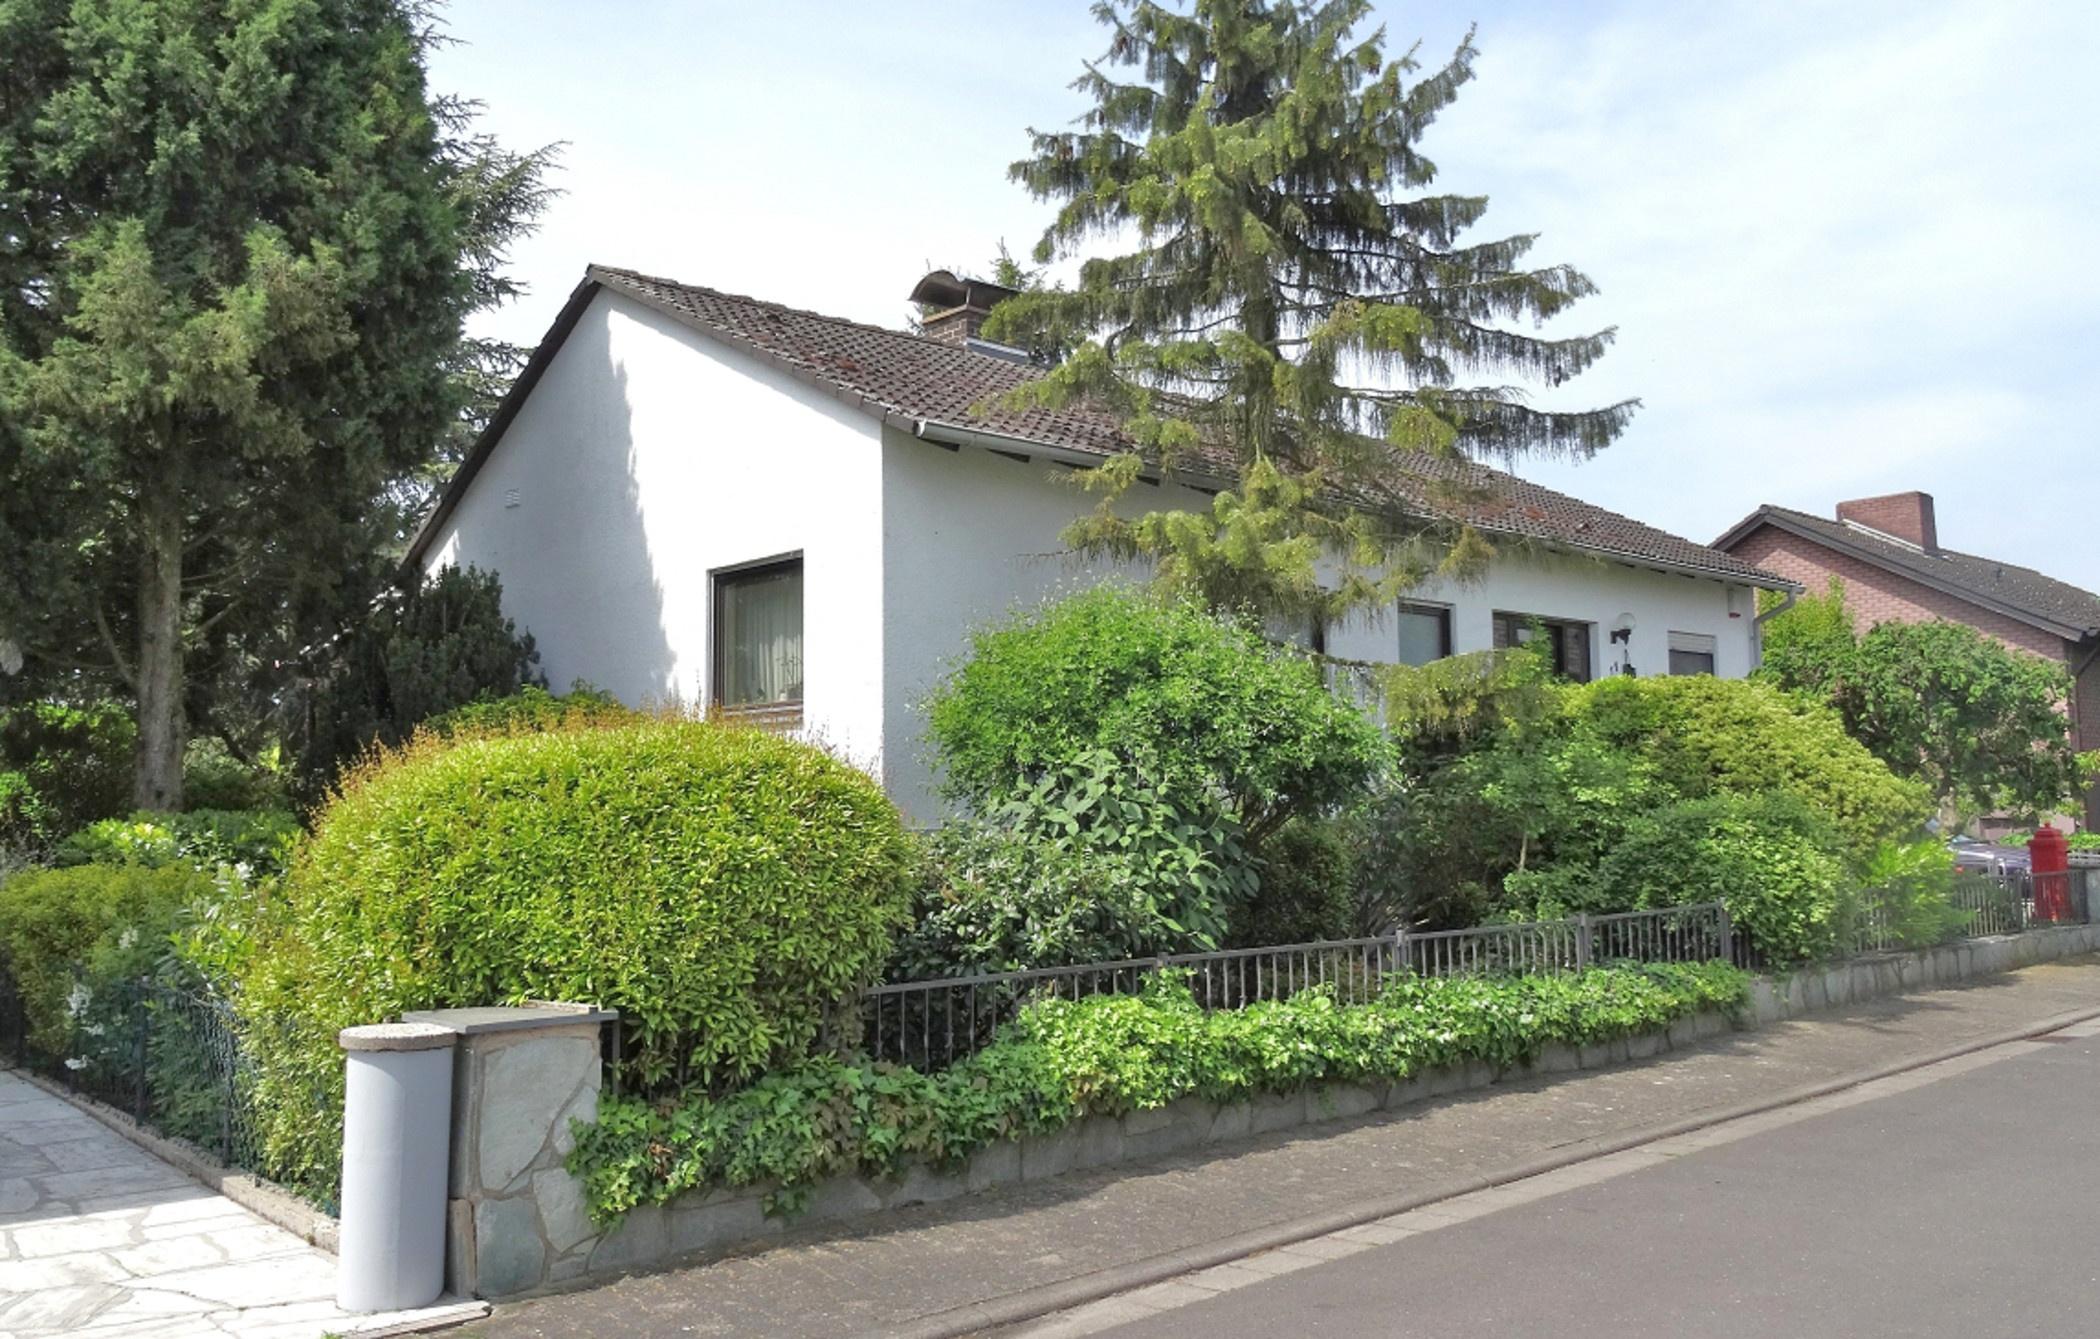 Lebenselixier Natur: Gepflegter Bungalow mit Urlaubspotenzial in Hohen-Sülzen!, 67591 Hohen Sülzen, Einfamilienhaus